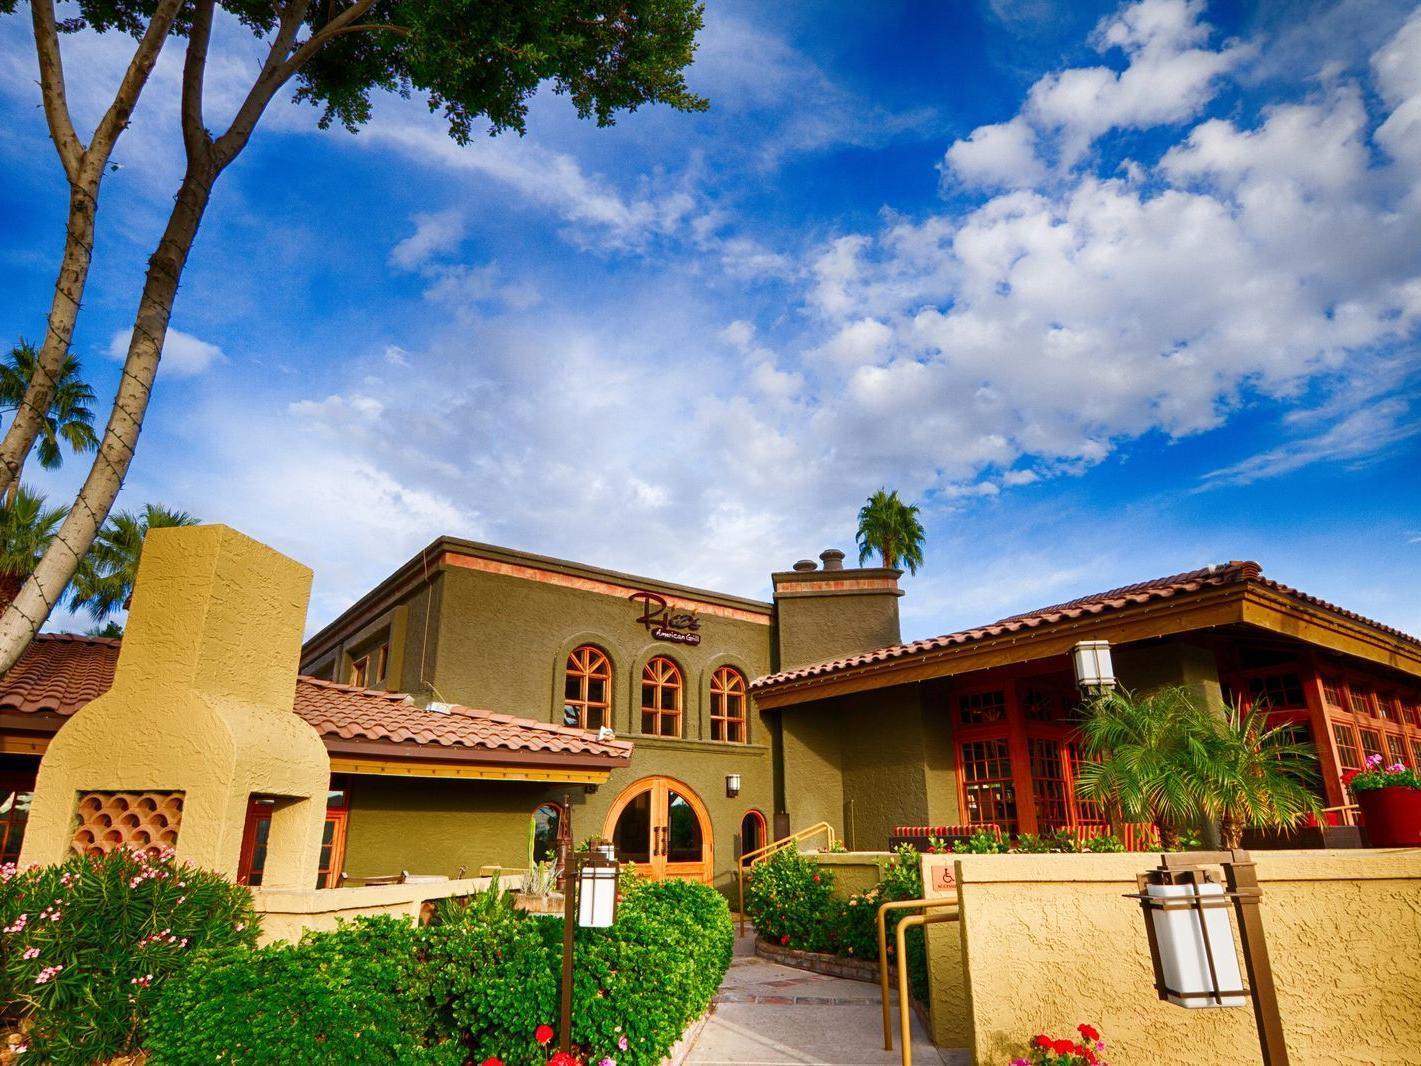 Dining And Restaurants In Phoenix Az Pointe Hilton Squaw